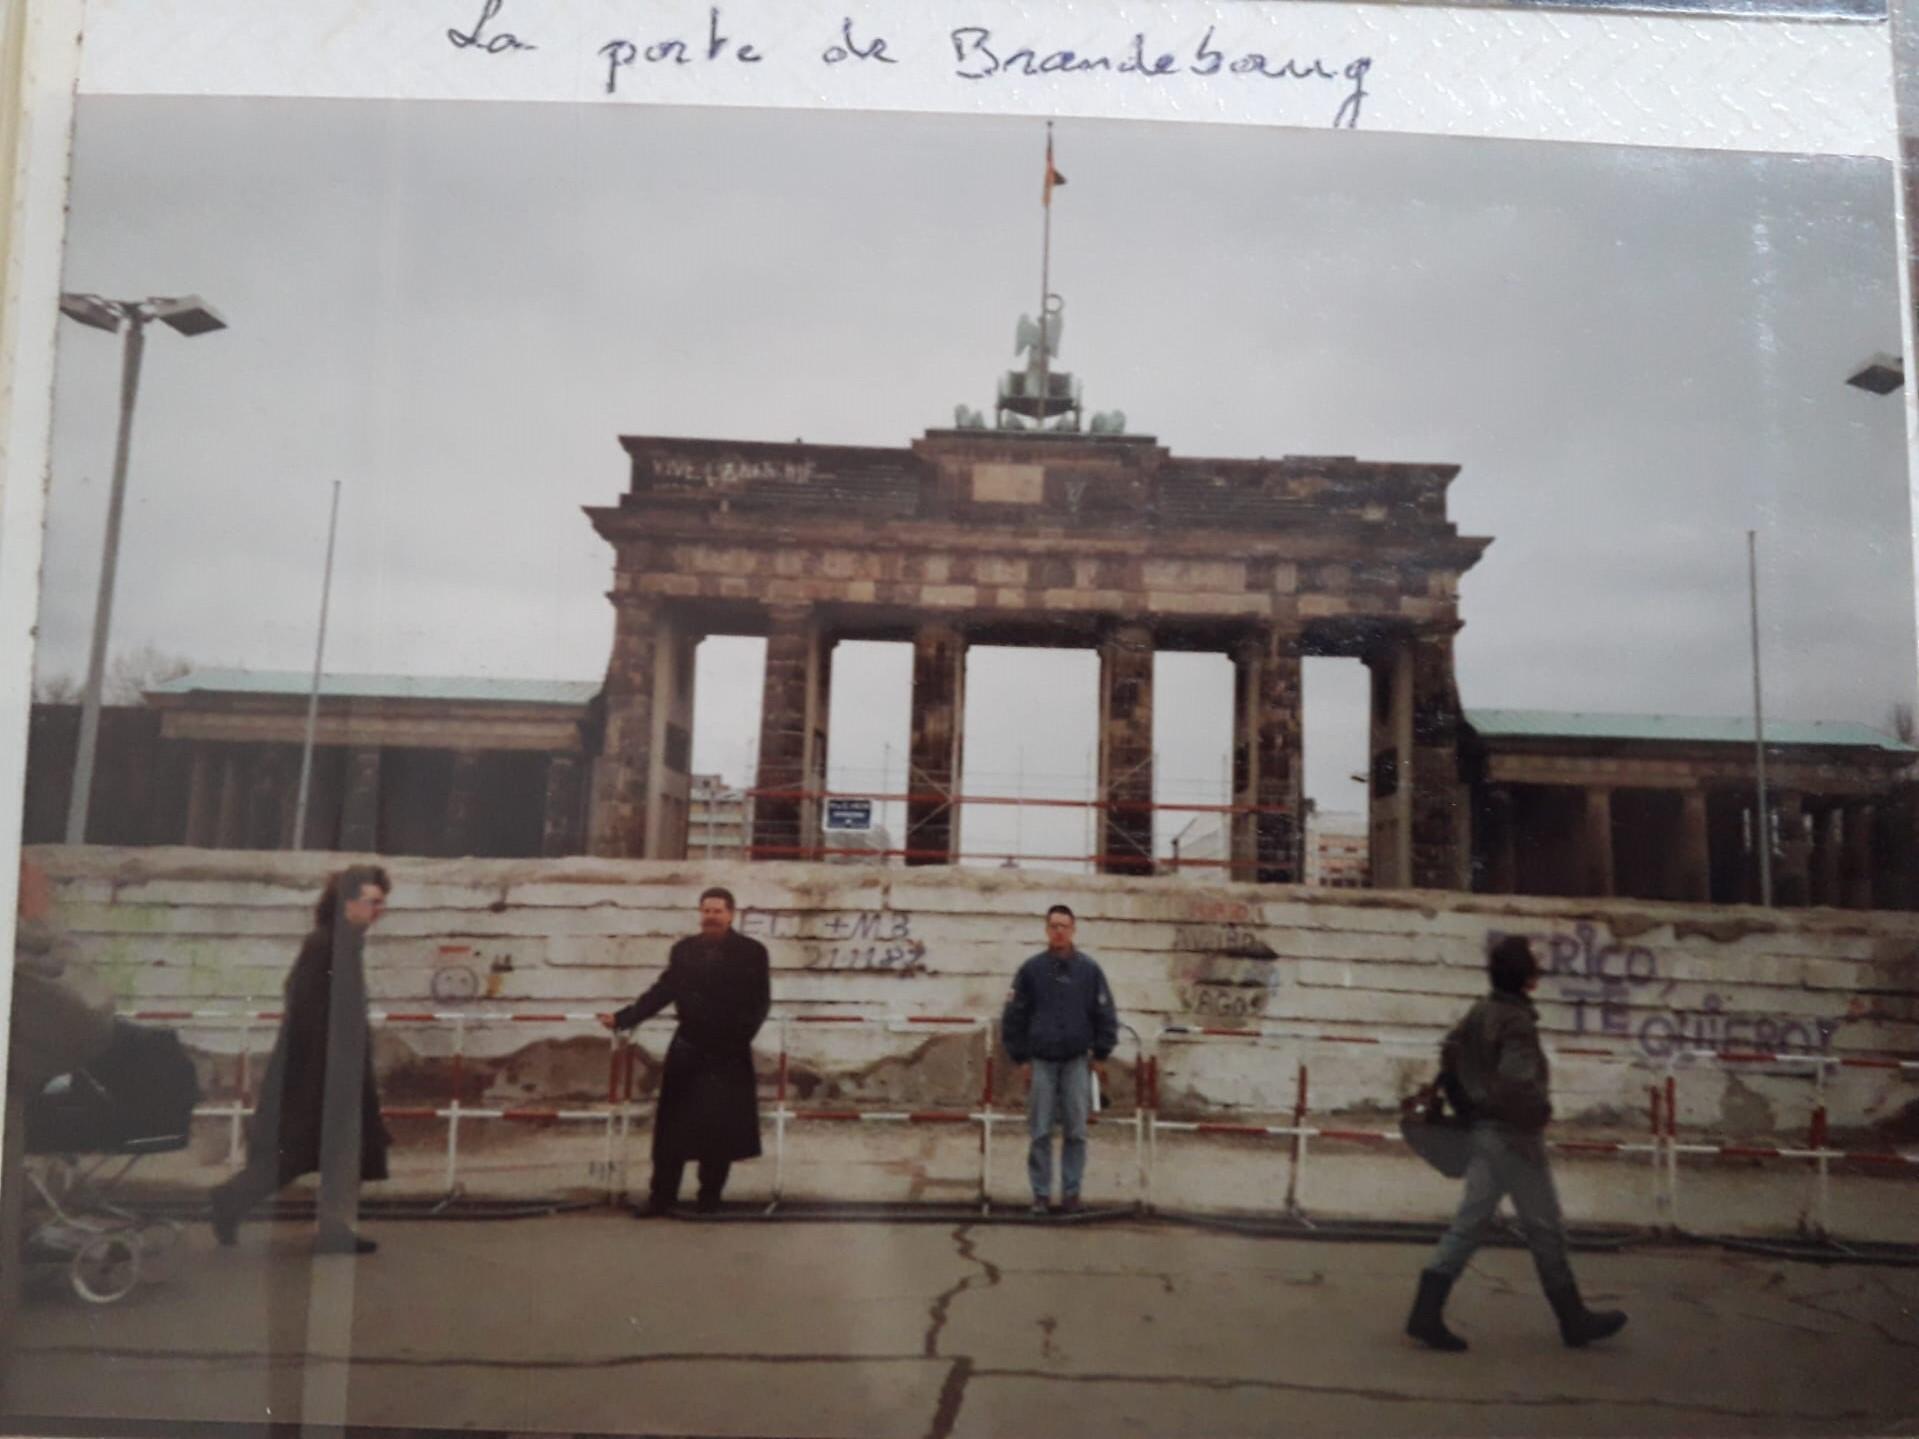 La porte de Brandebourg était devenue le symbole de la division de Berlin.